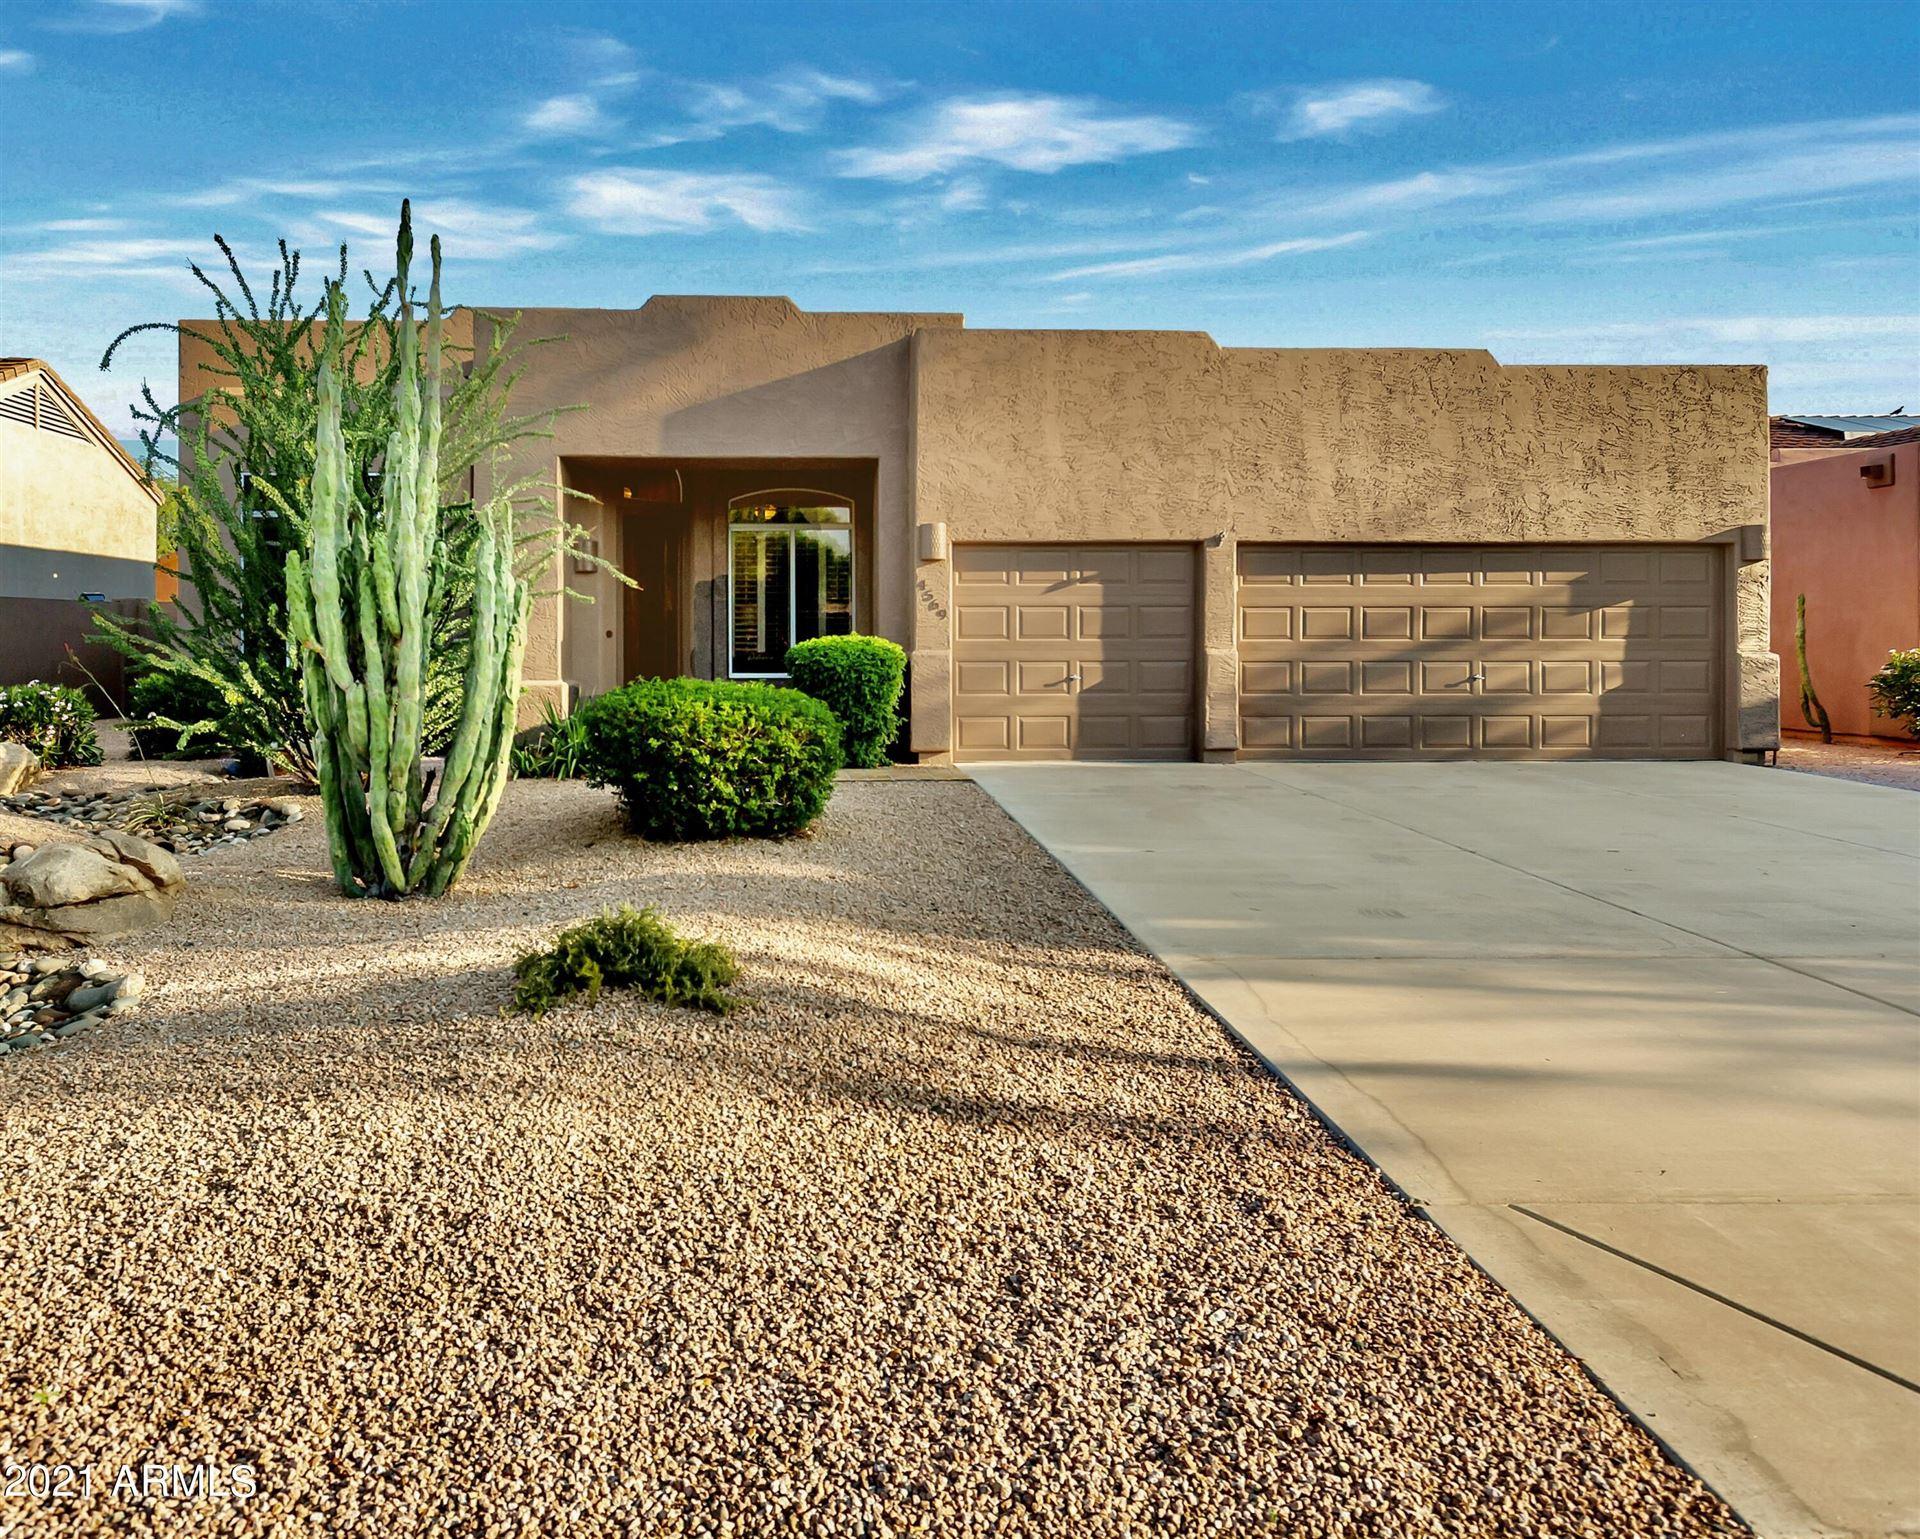 4569 E PINNACLE VISTA Drive, Cave Creek, AZ 85331 - MLS#: 6274753